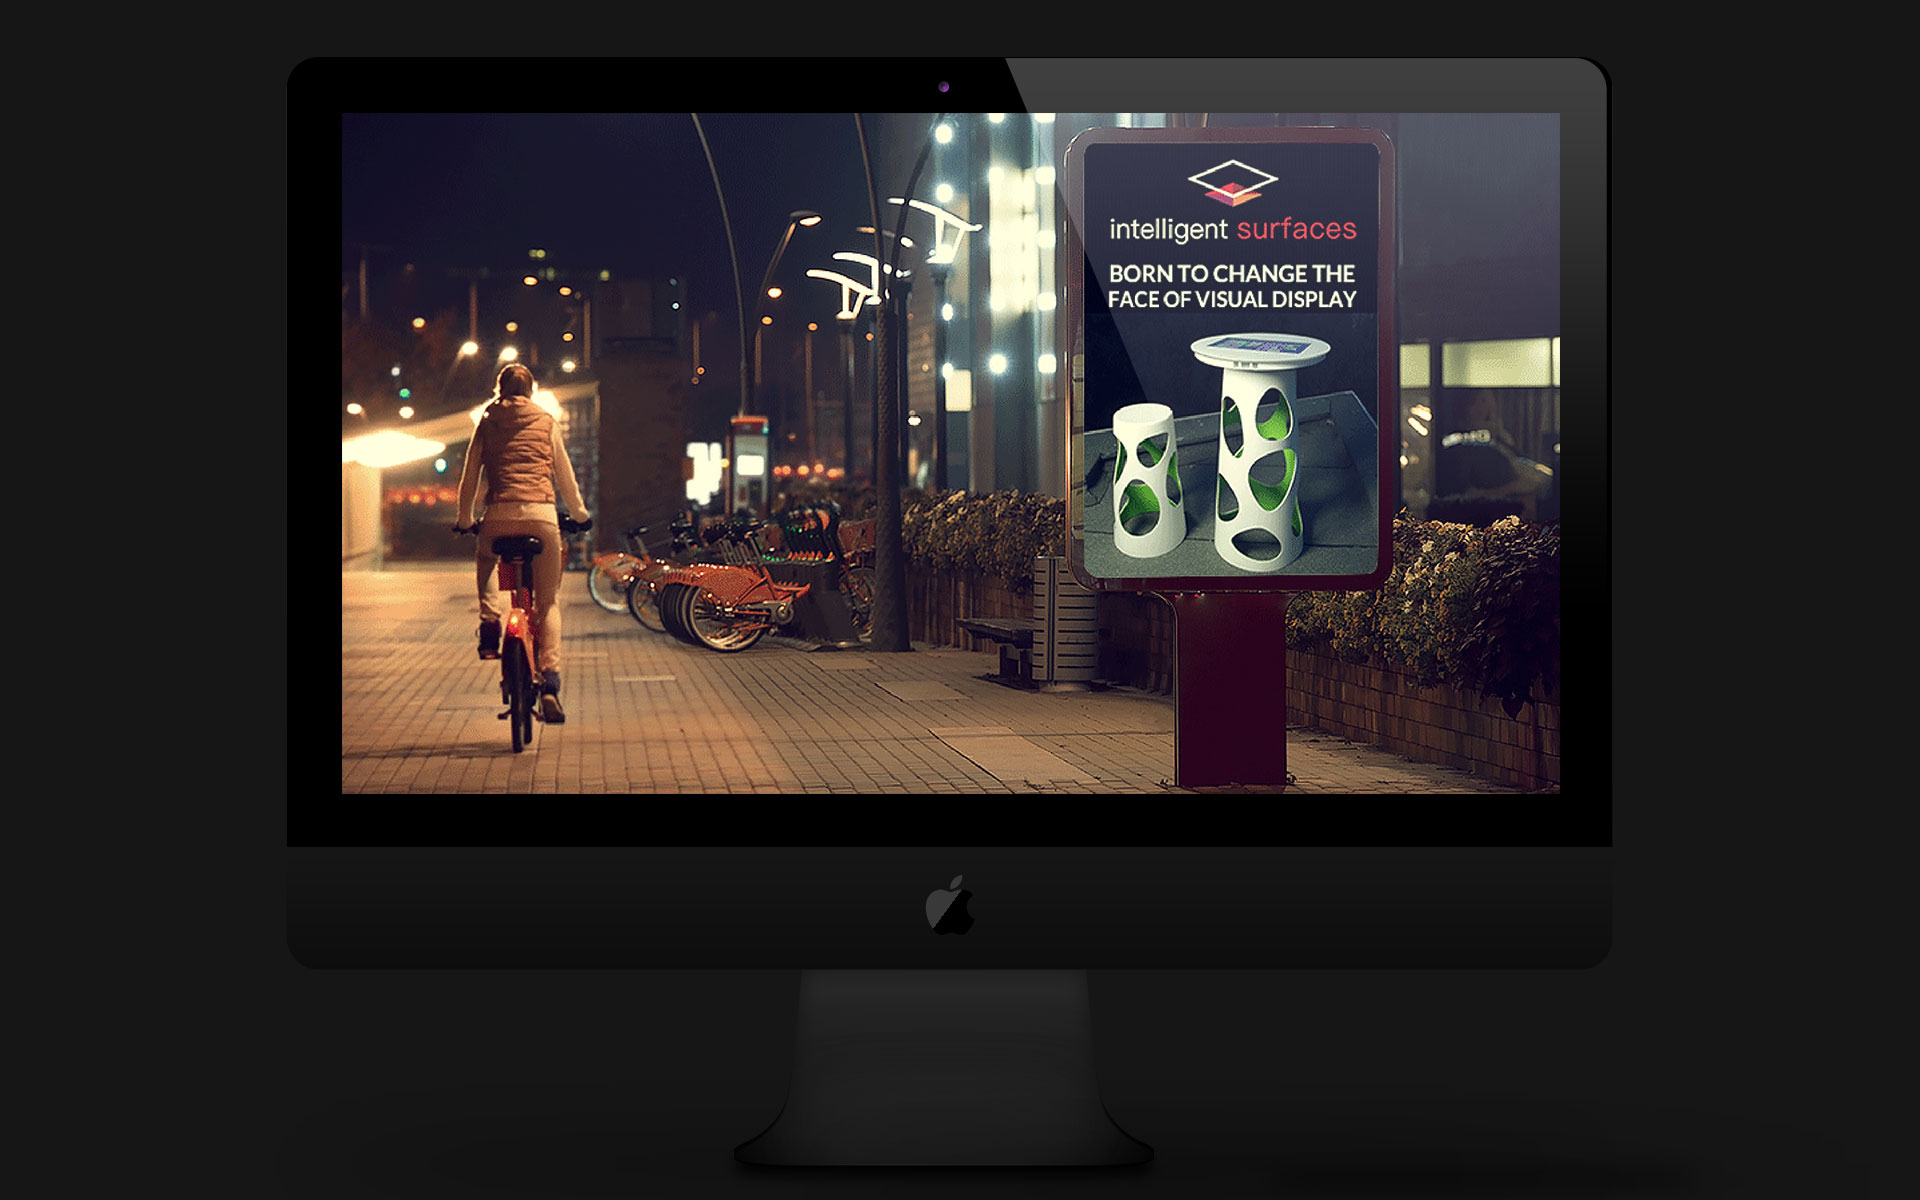 intelligent-surfaces-desktop-screen